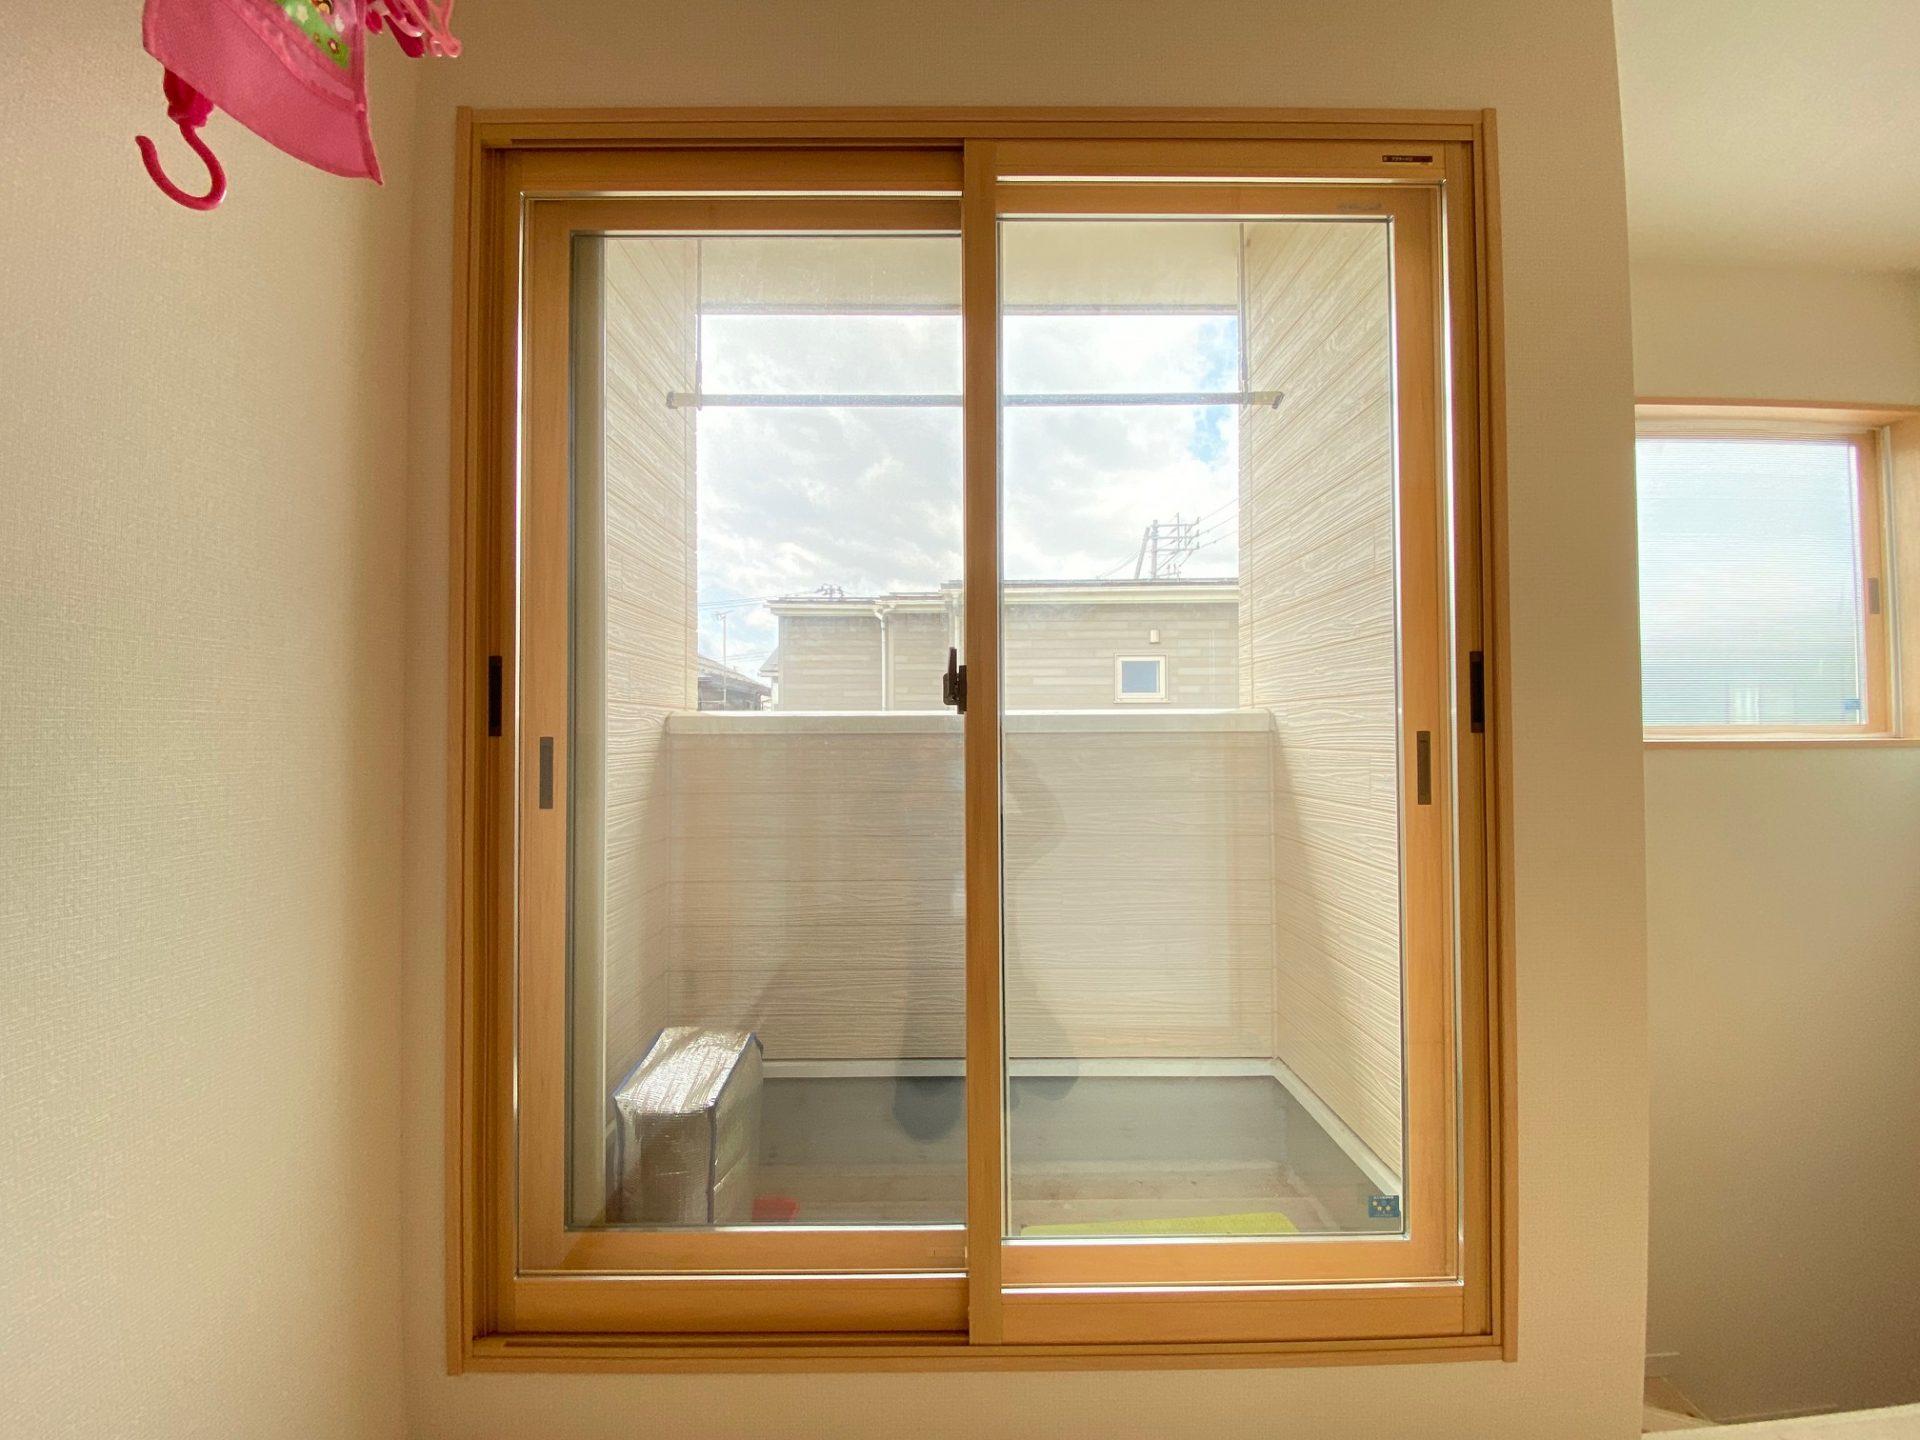 長岡市 内窓設置工事~窓際の断熱対策